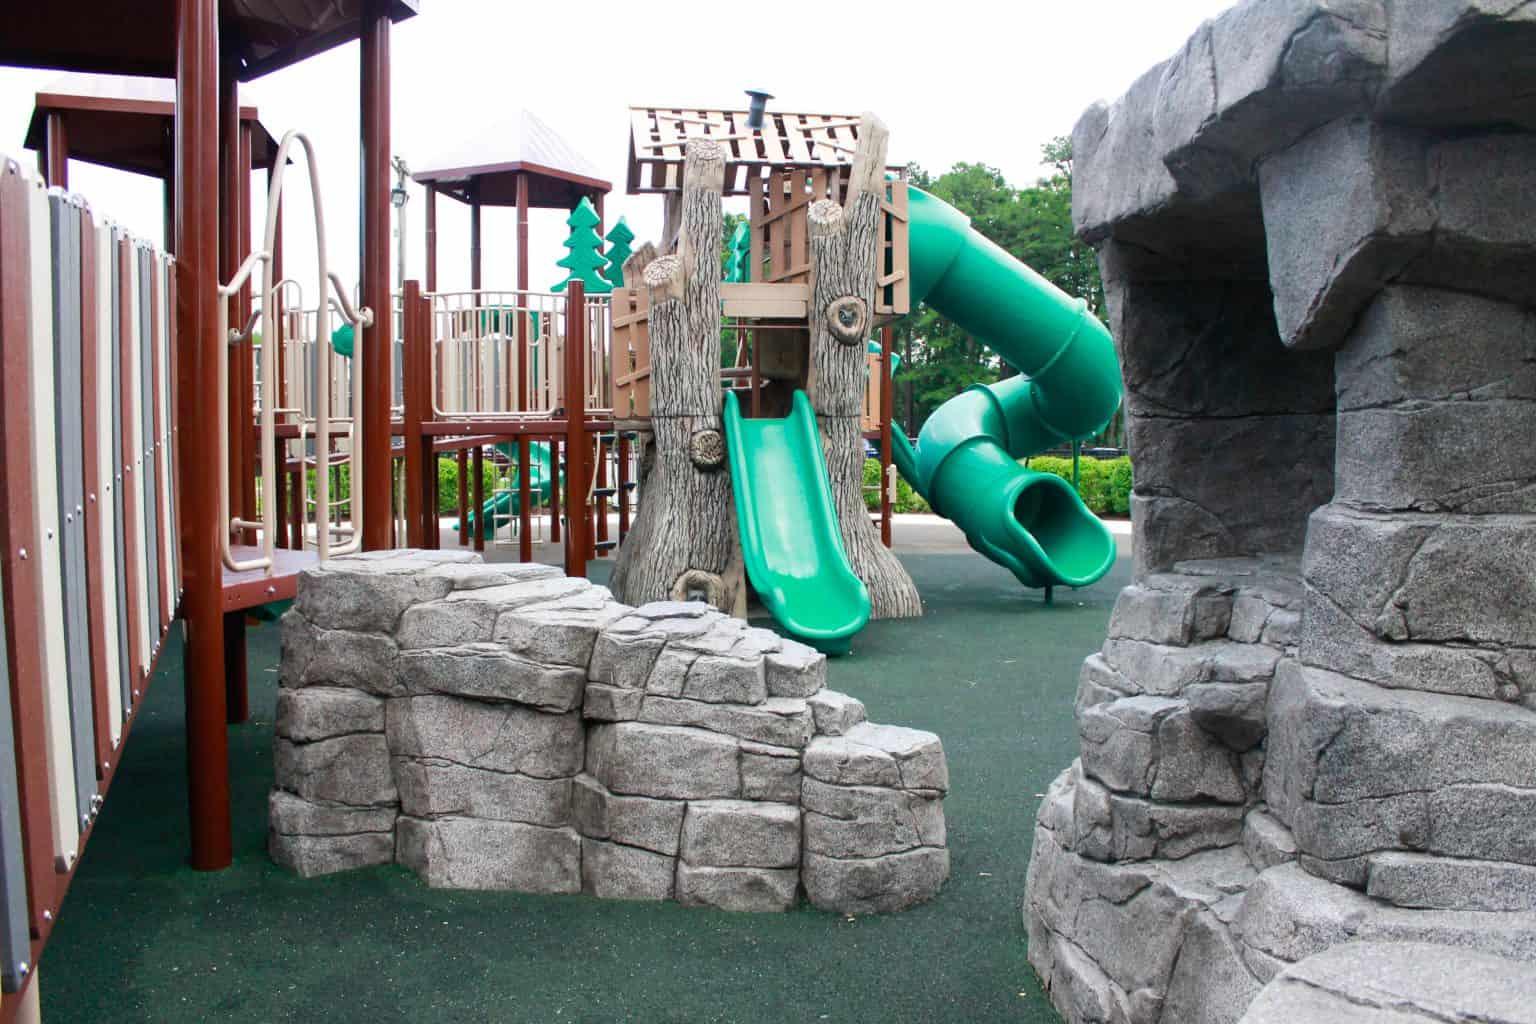 windward-beach-park-playground-brick-nj_27651421273_o-1536x1024